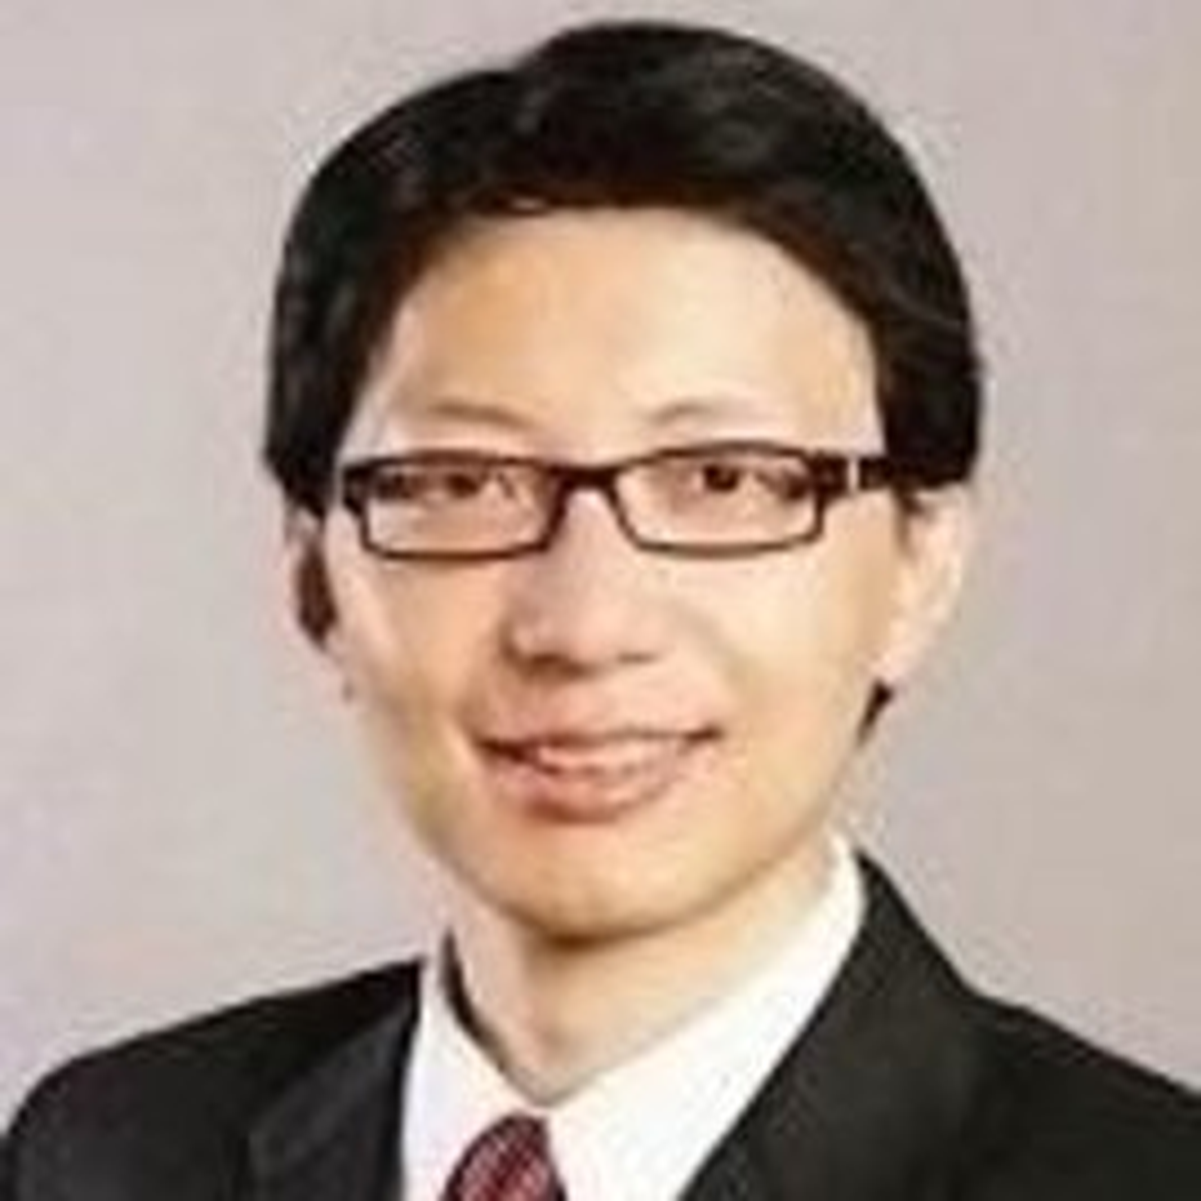 Yuhai Xuan